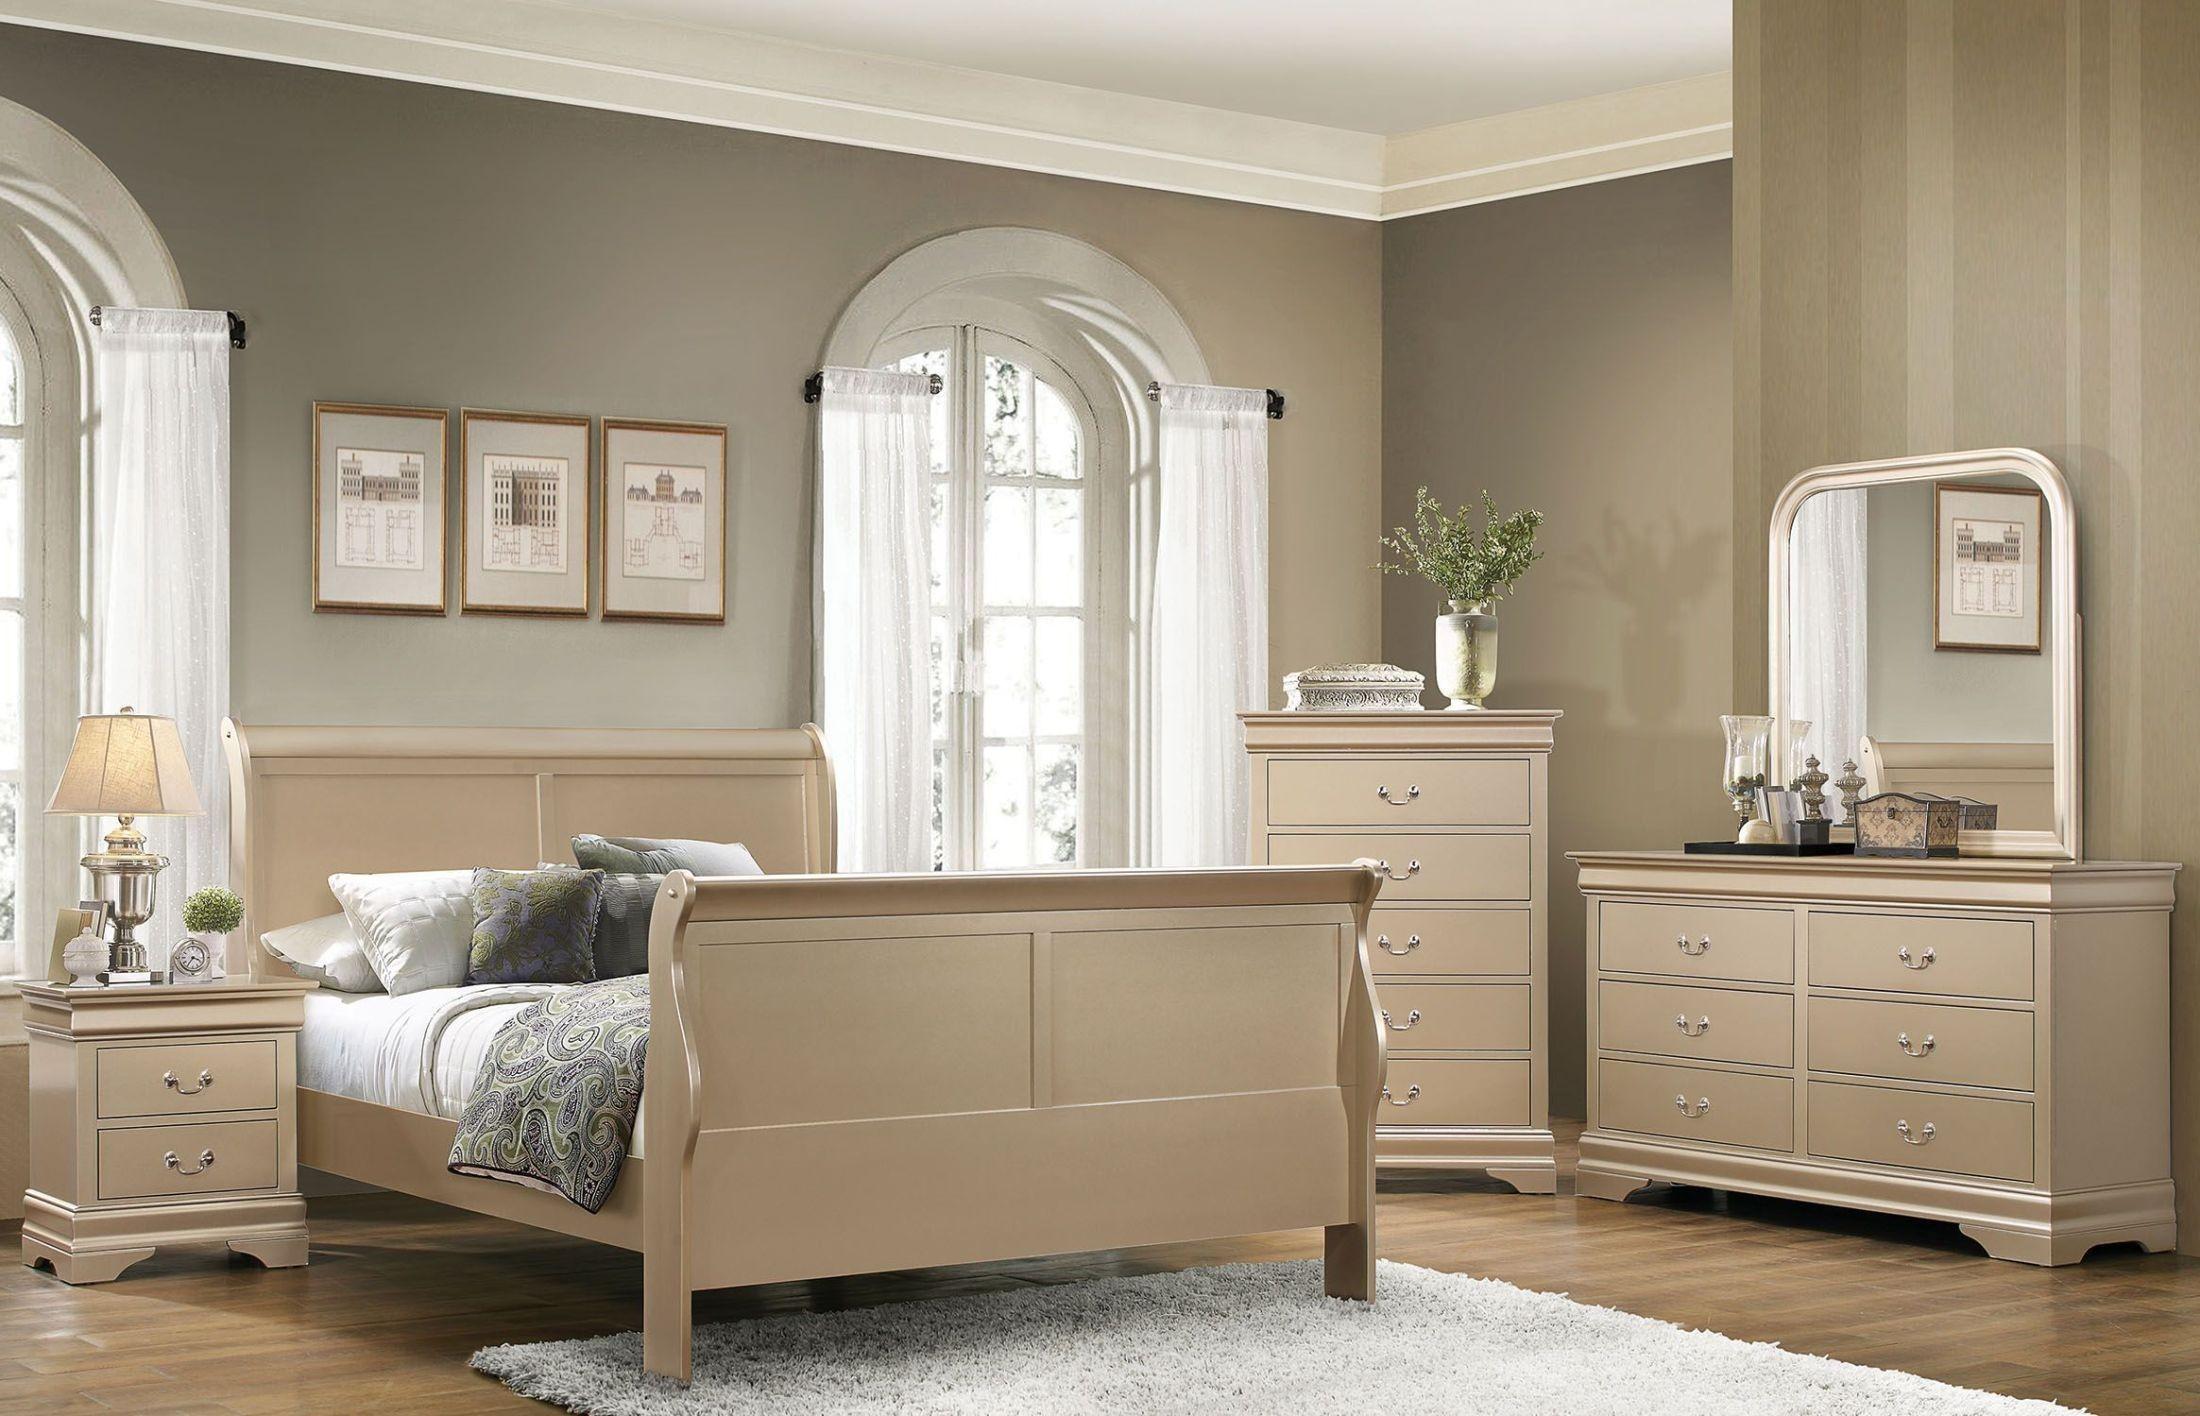 Hershel Louis Philippe Metallic Champagne Panel Bedroom Set 204421Q Coaster